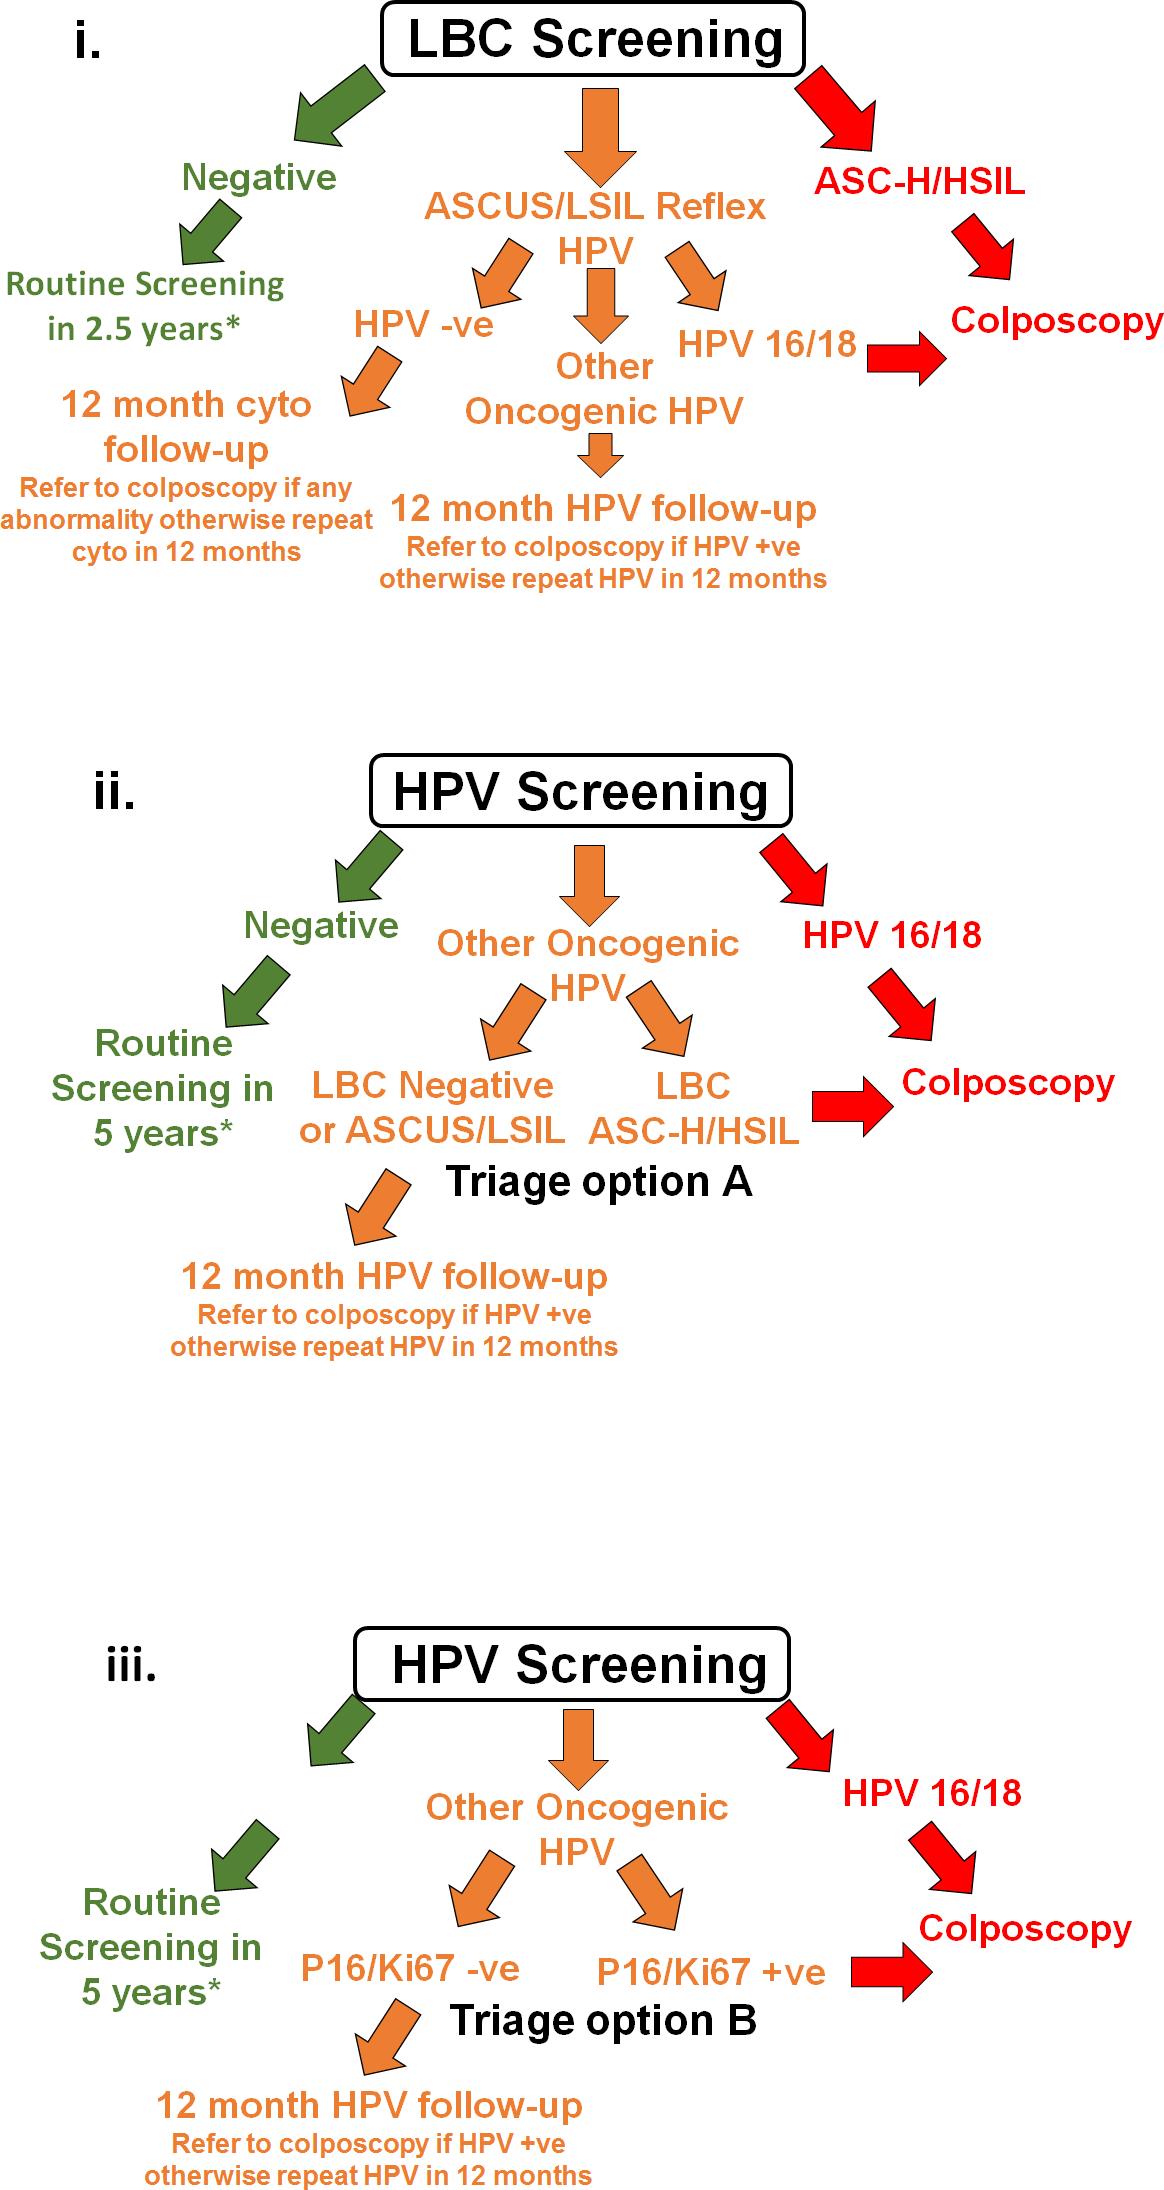 hpv treatment colposcopy neuroendocrine cancer kya hota hai